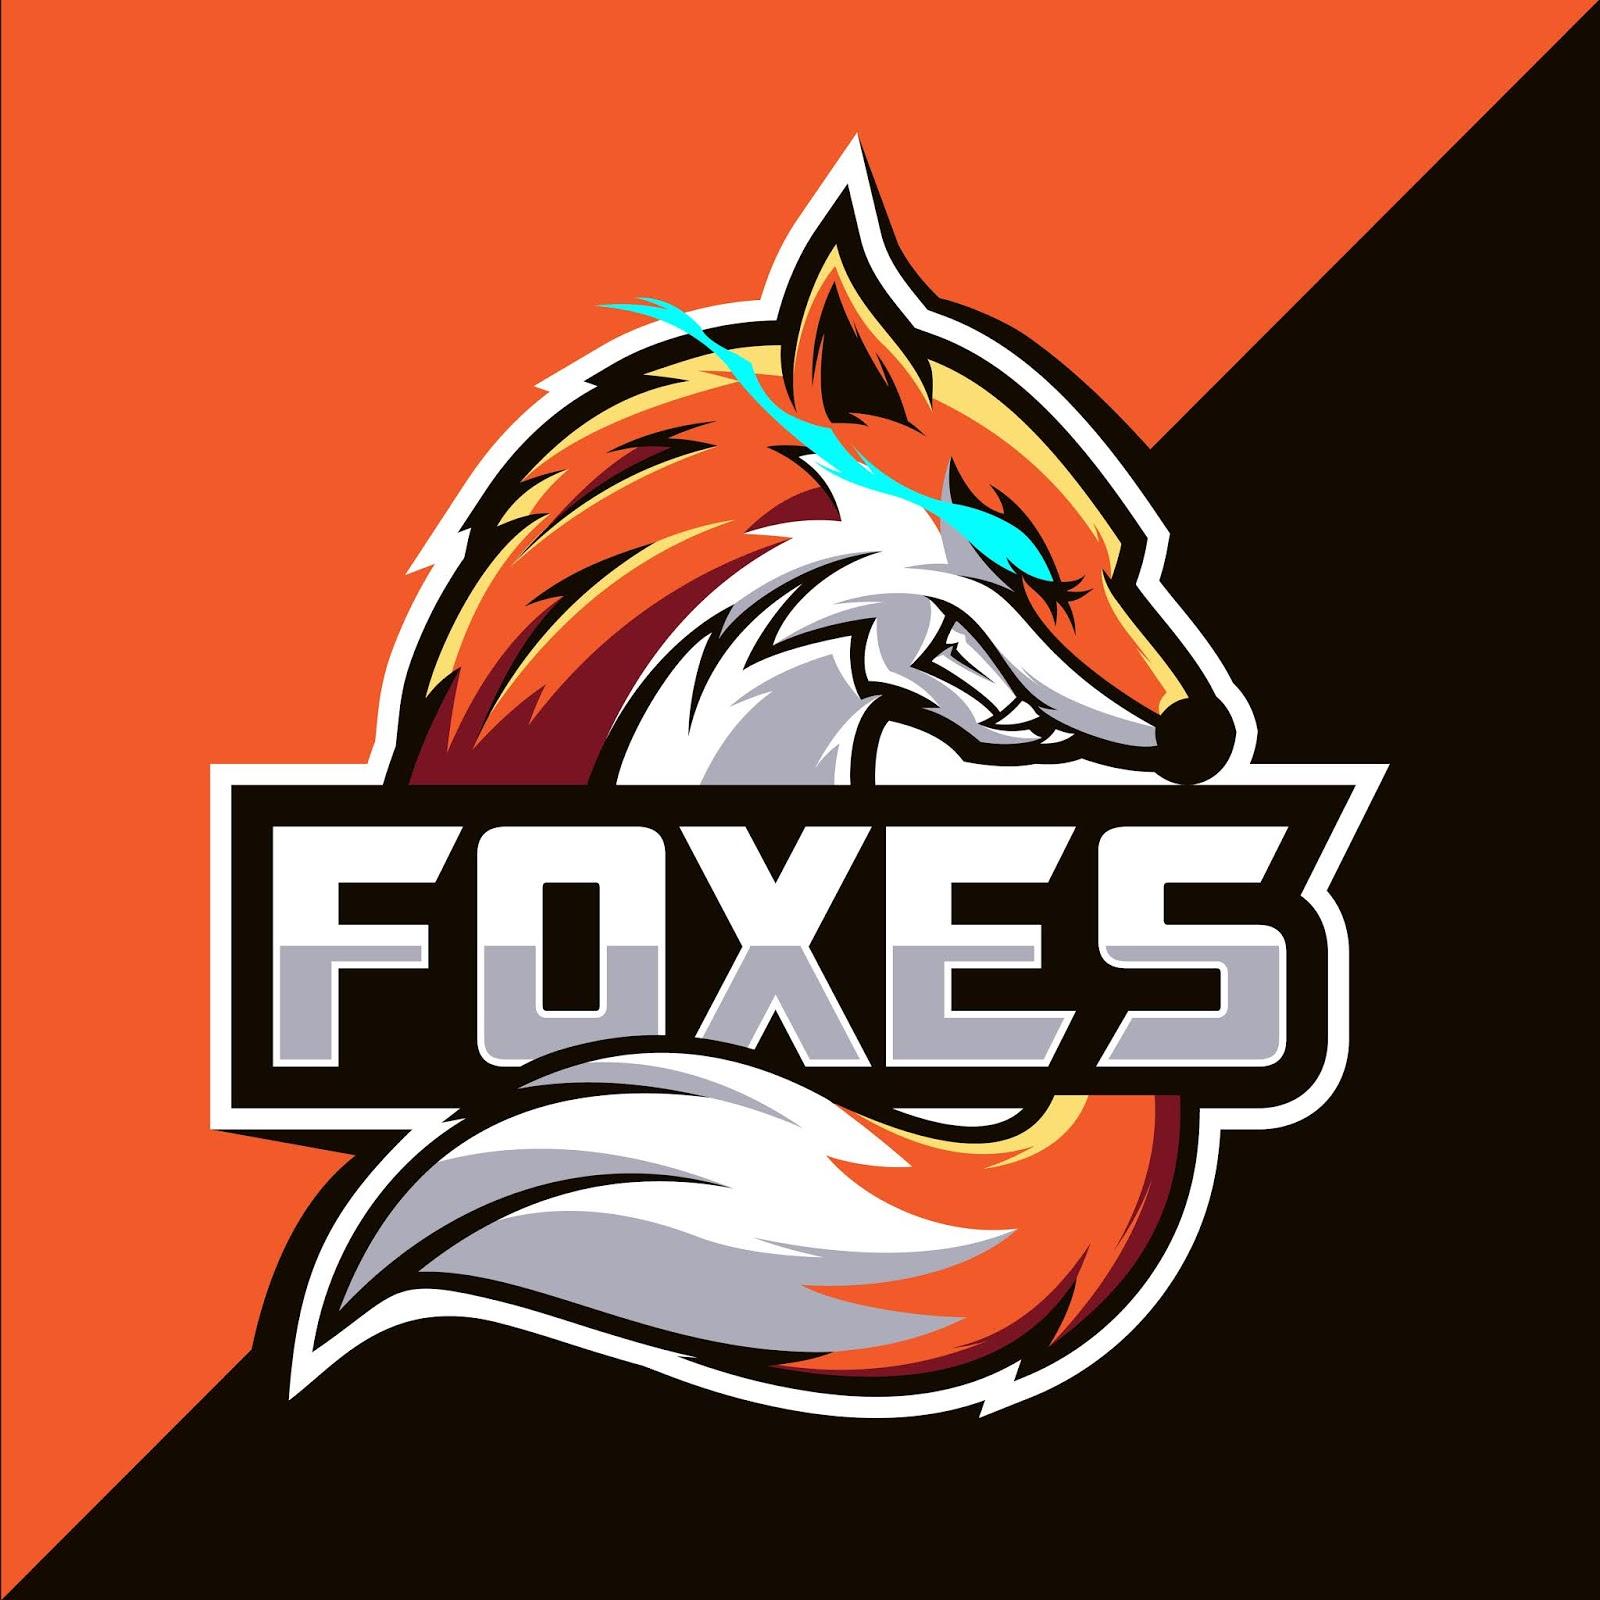 Fox Mascot Esport Logo Free Download Vector CDR, AI, EPS and PNG Formats